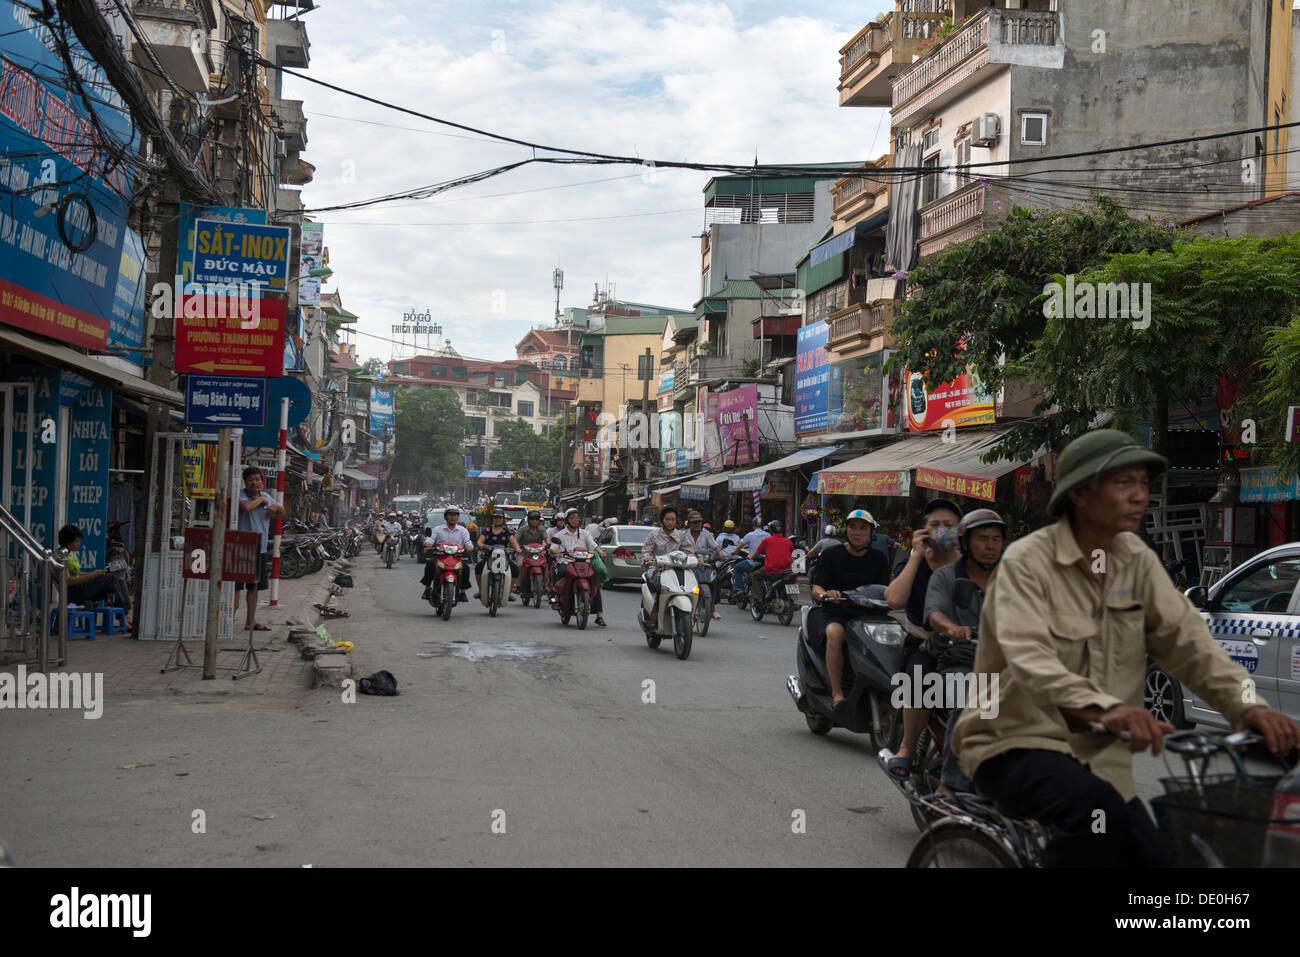 Hanoi street view of motorcycle, Hanoi, Vietnam - Stock Image